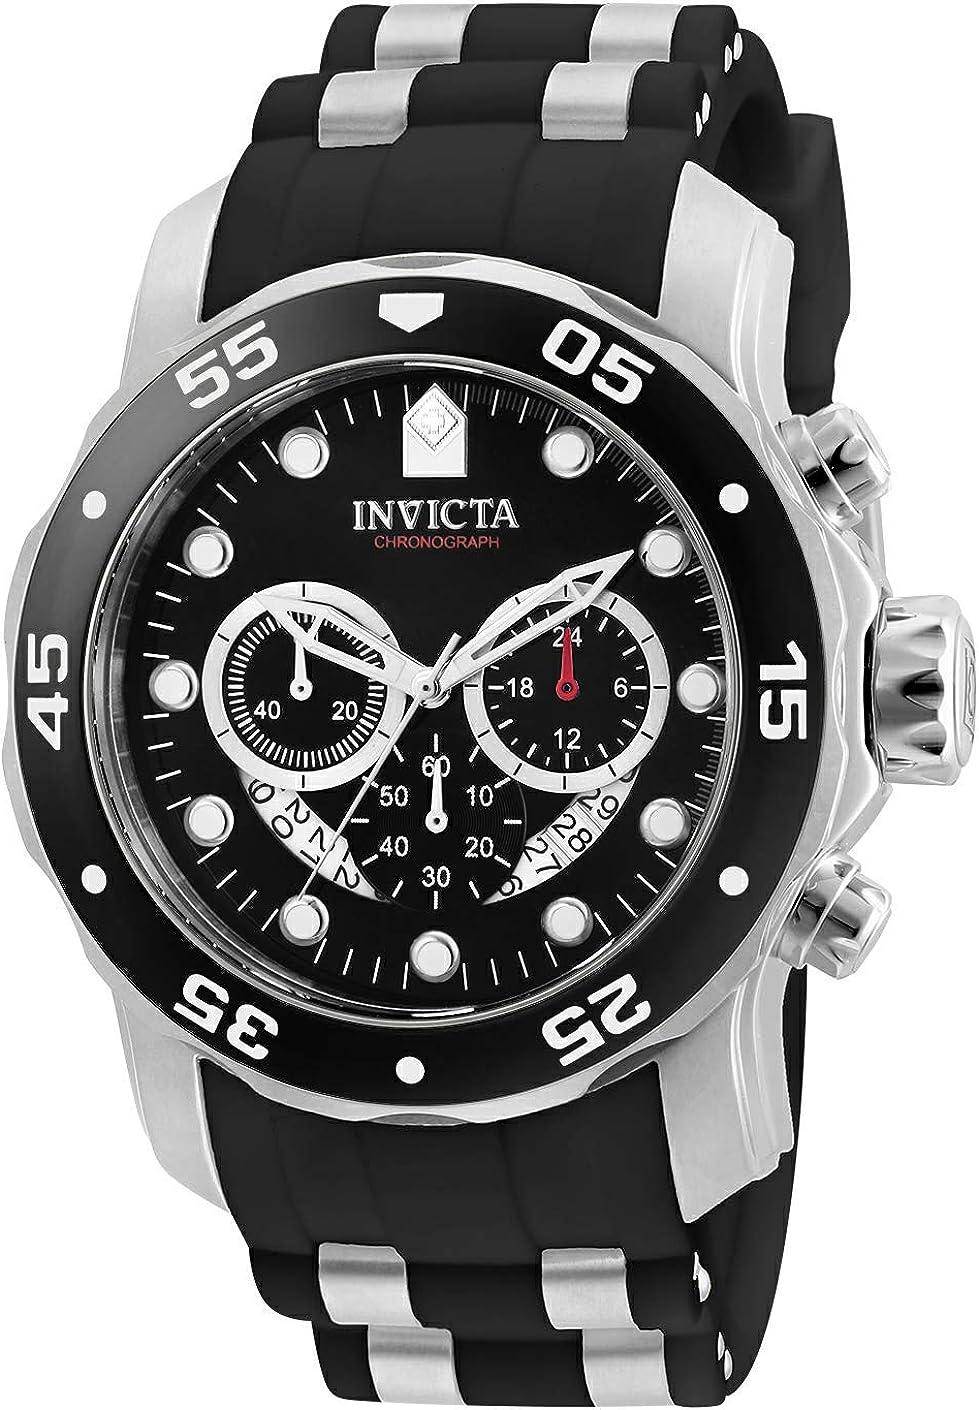 Invicta Men's Pro Diver Scuba 48mm Stainless Steel Quartz Watch with Black Silicone Strap, Black (Model: 6977)